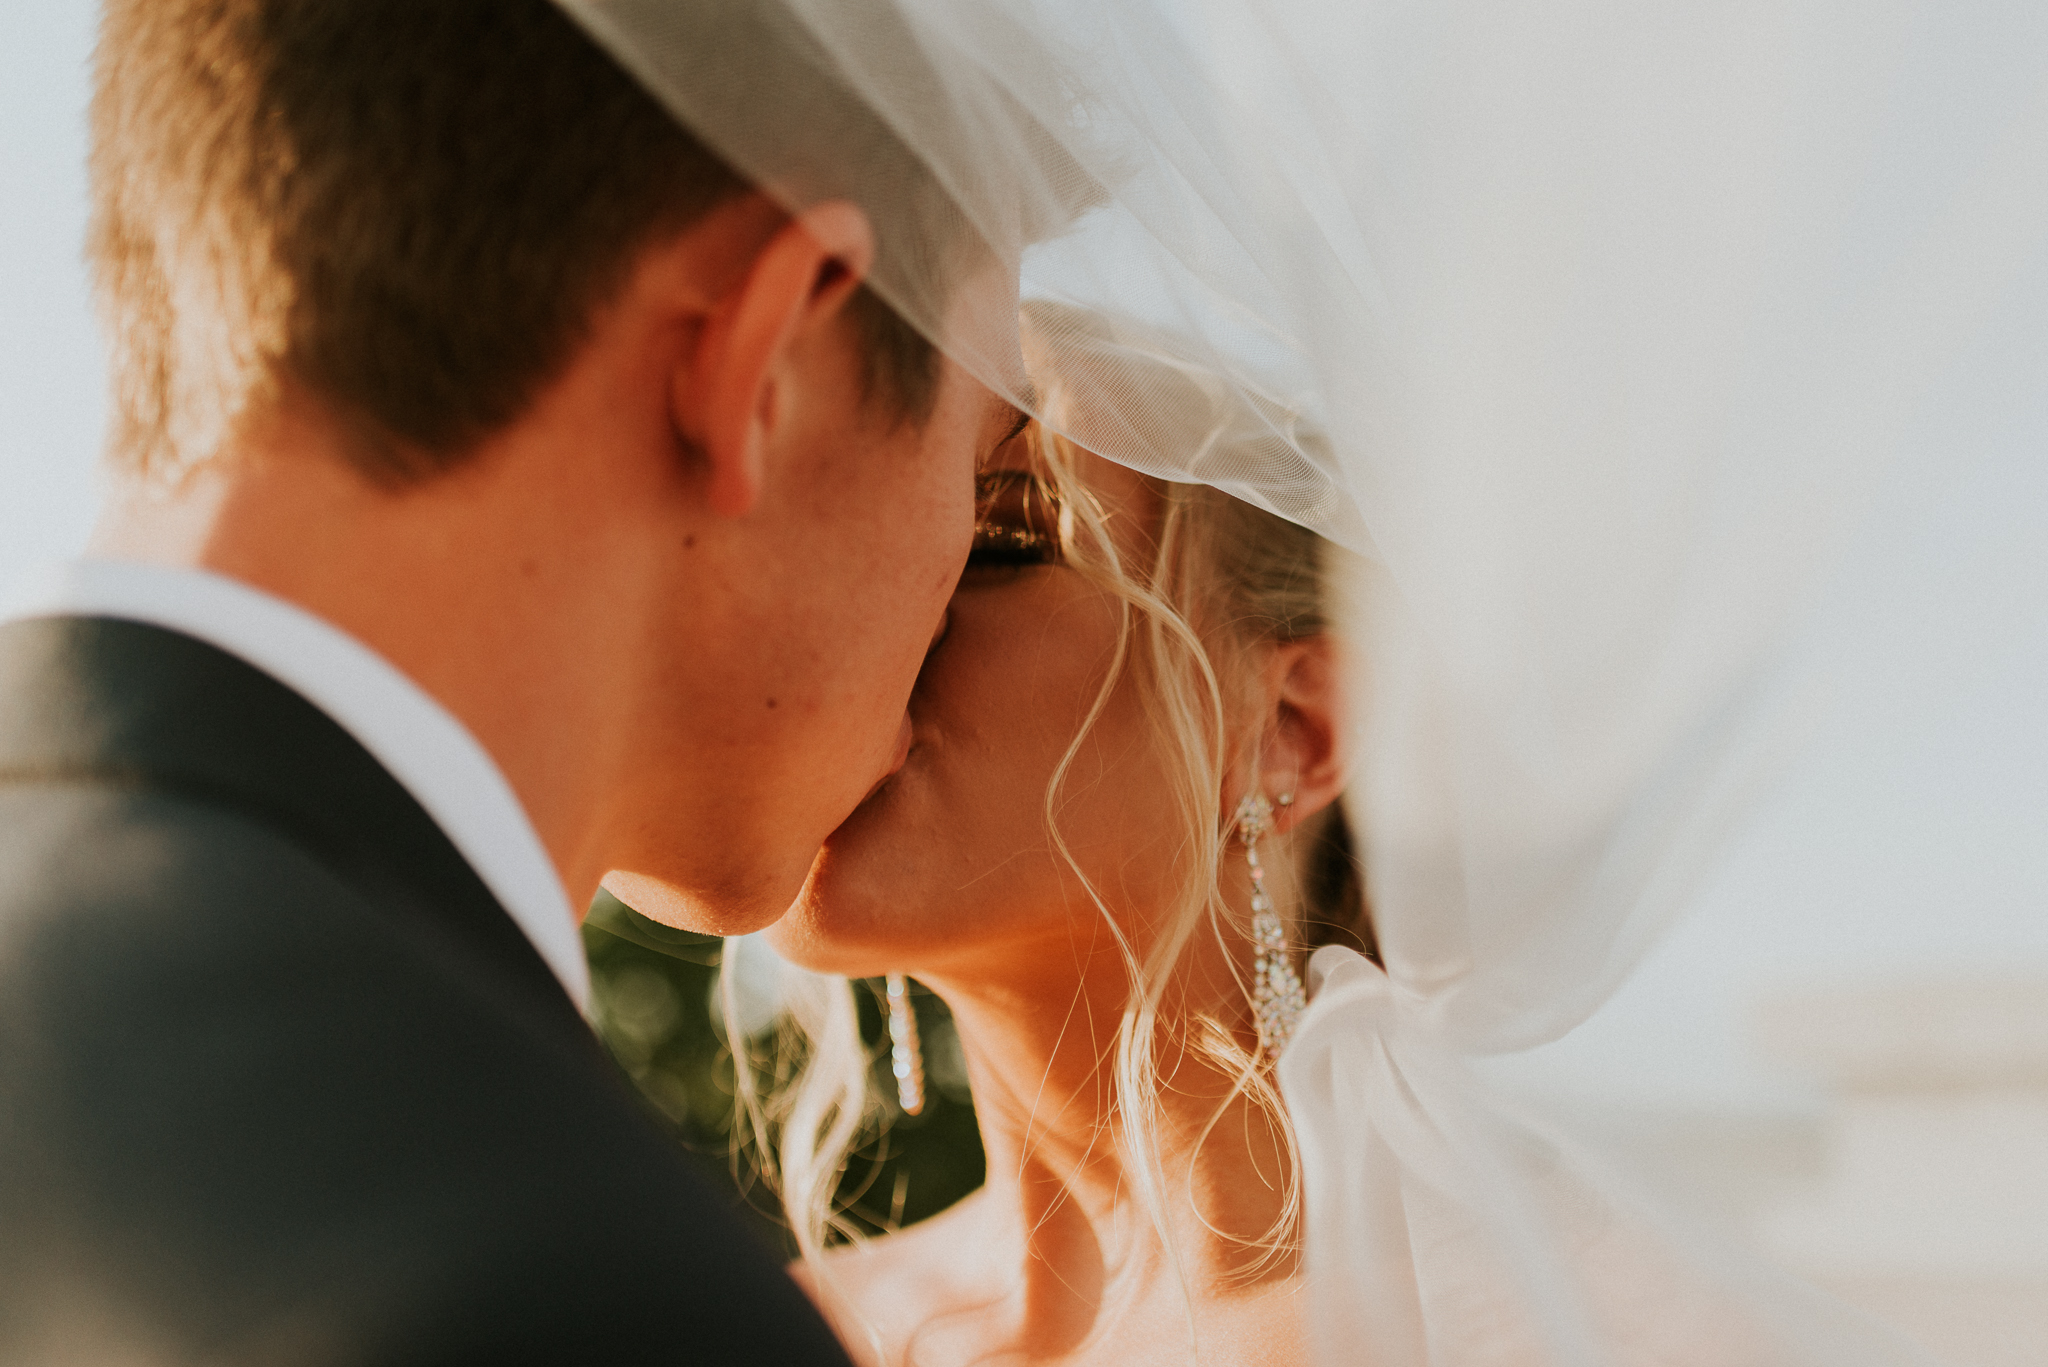 east-tn-wedding-photographer-tennessee-elopement-photographer-kingsport-tn-wedding-photographer (39 of 50).jpg